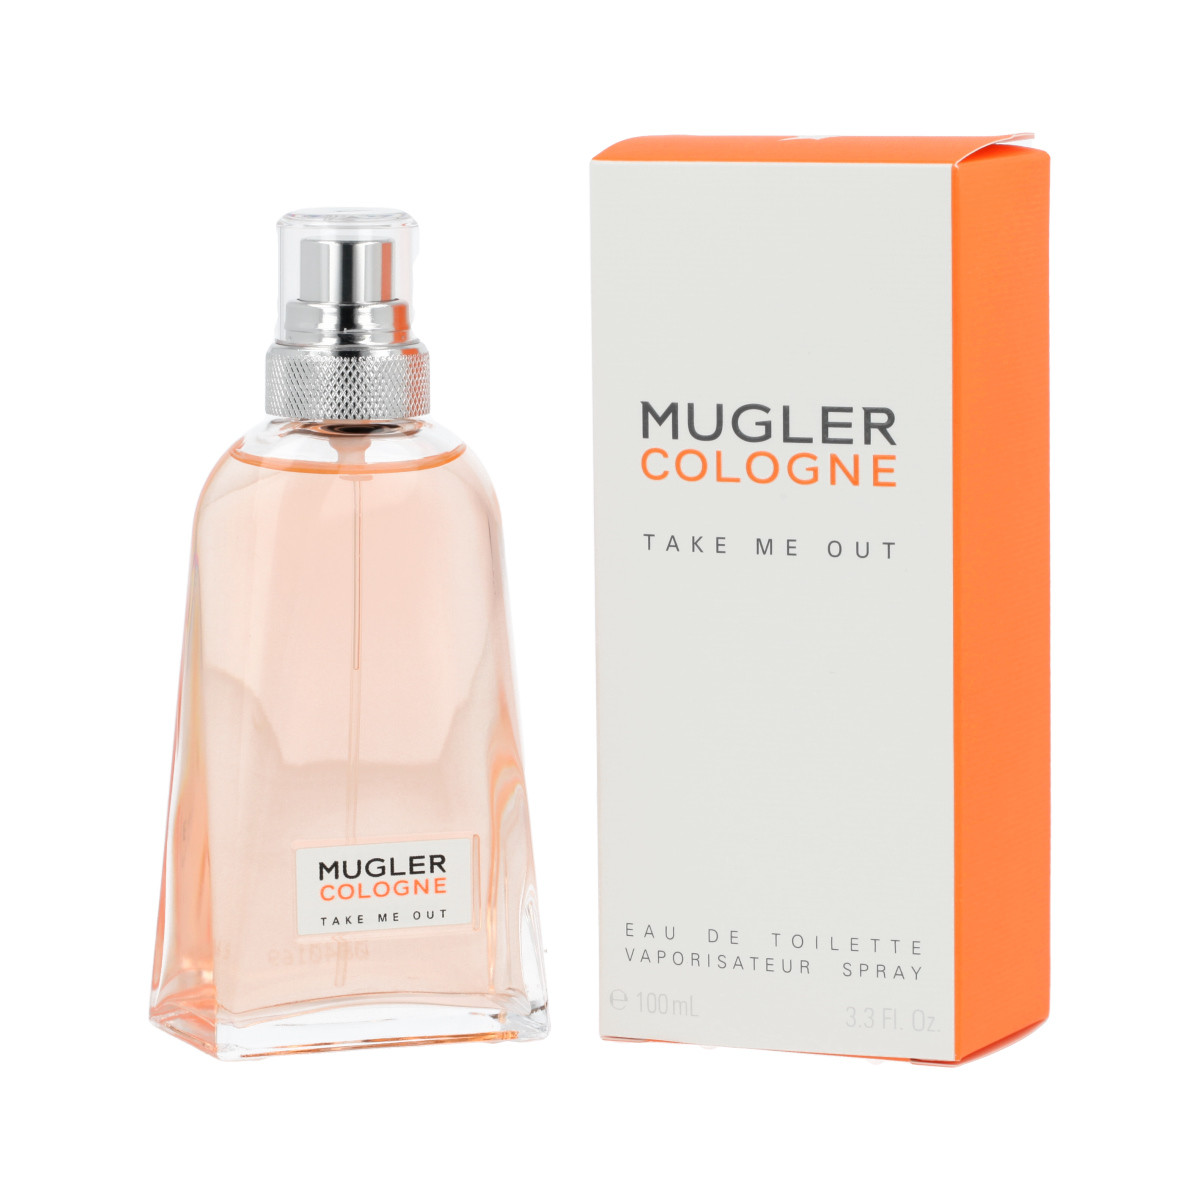 Mugler Cologne Take me out, edt 100ml - Teszter